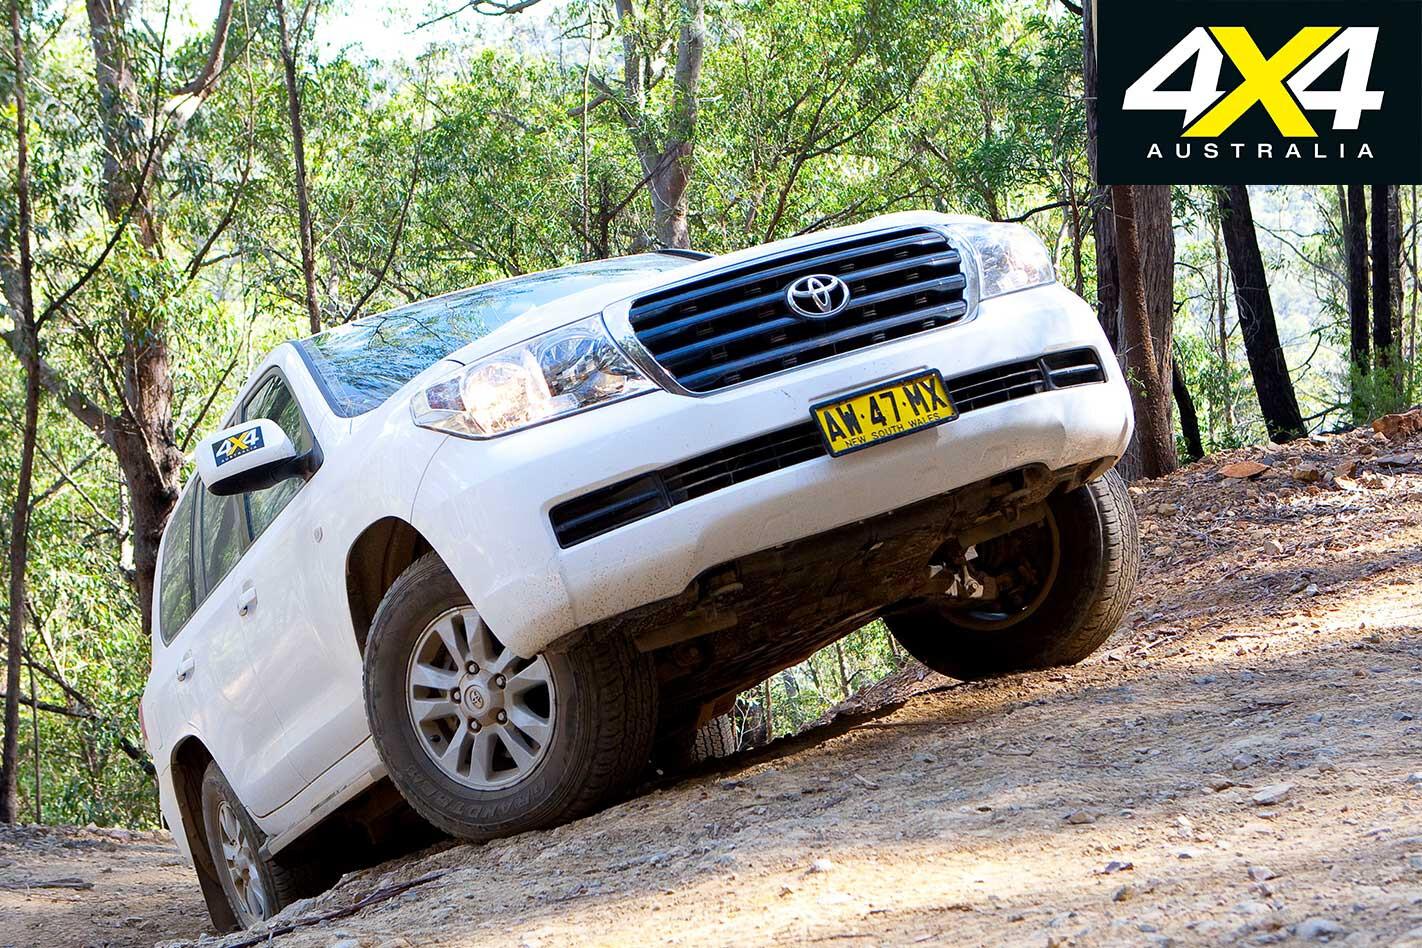 2009 Toyota Land Cruiser 200 Off Road Climb Jpg